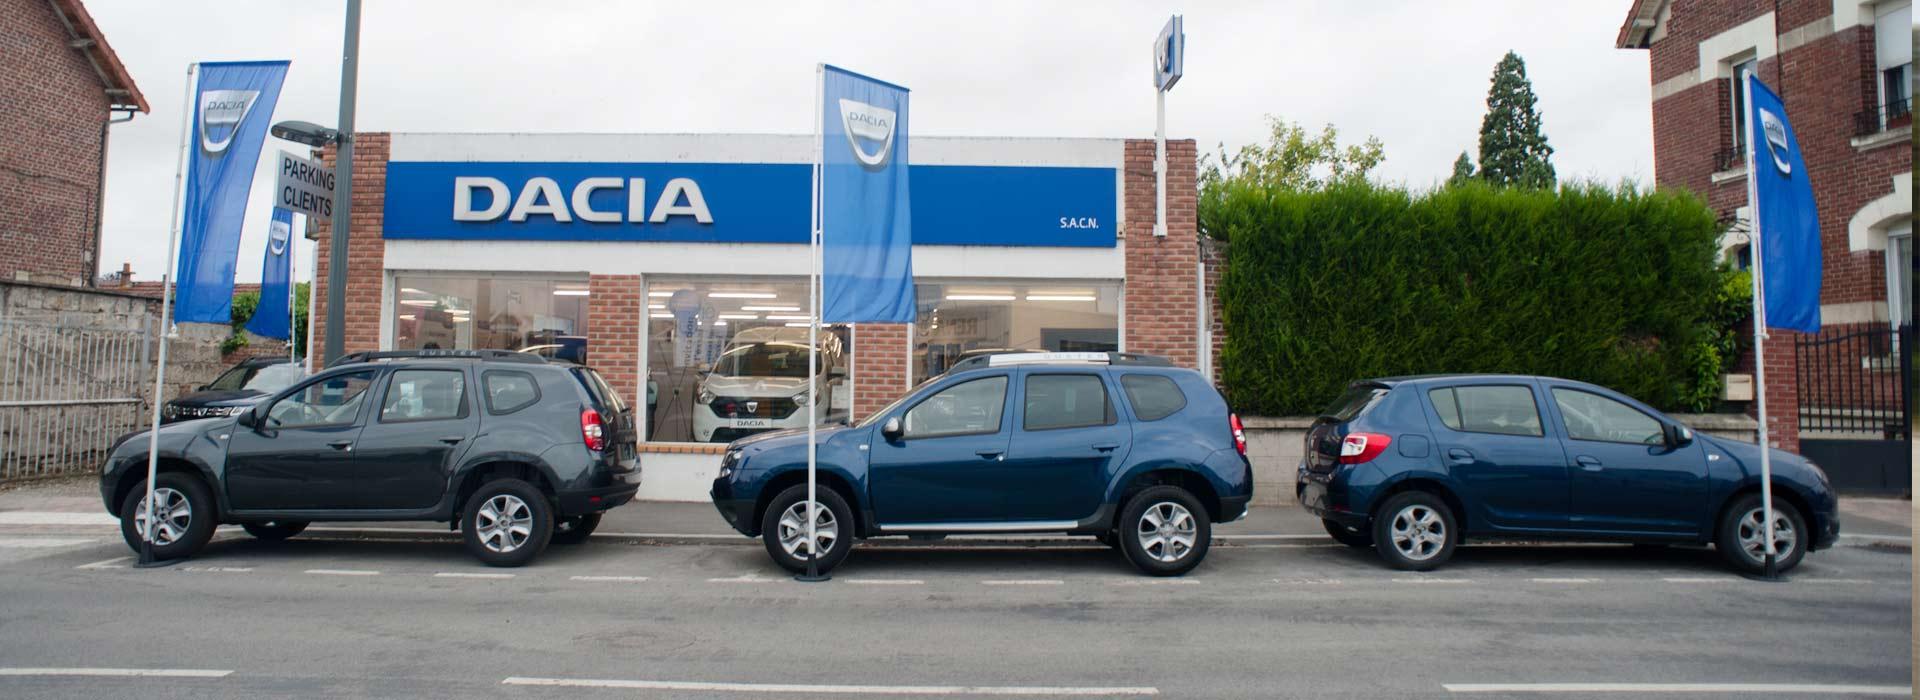 Dacia Chauny